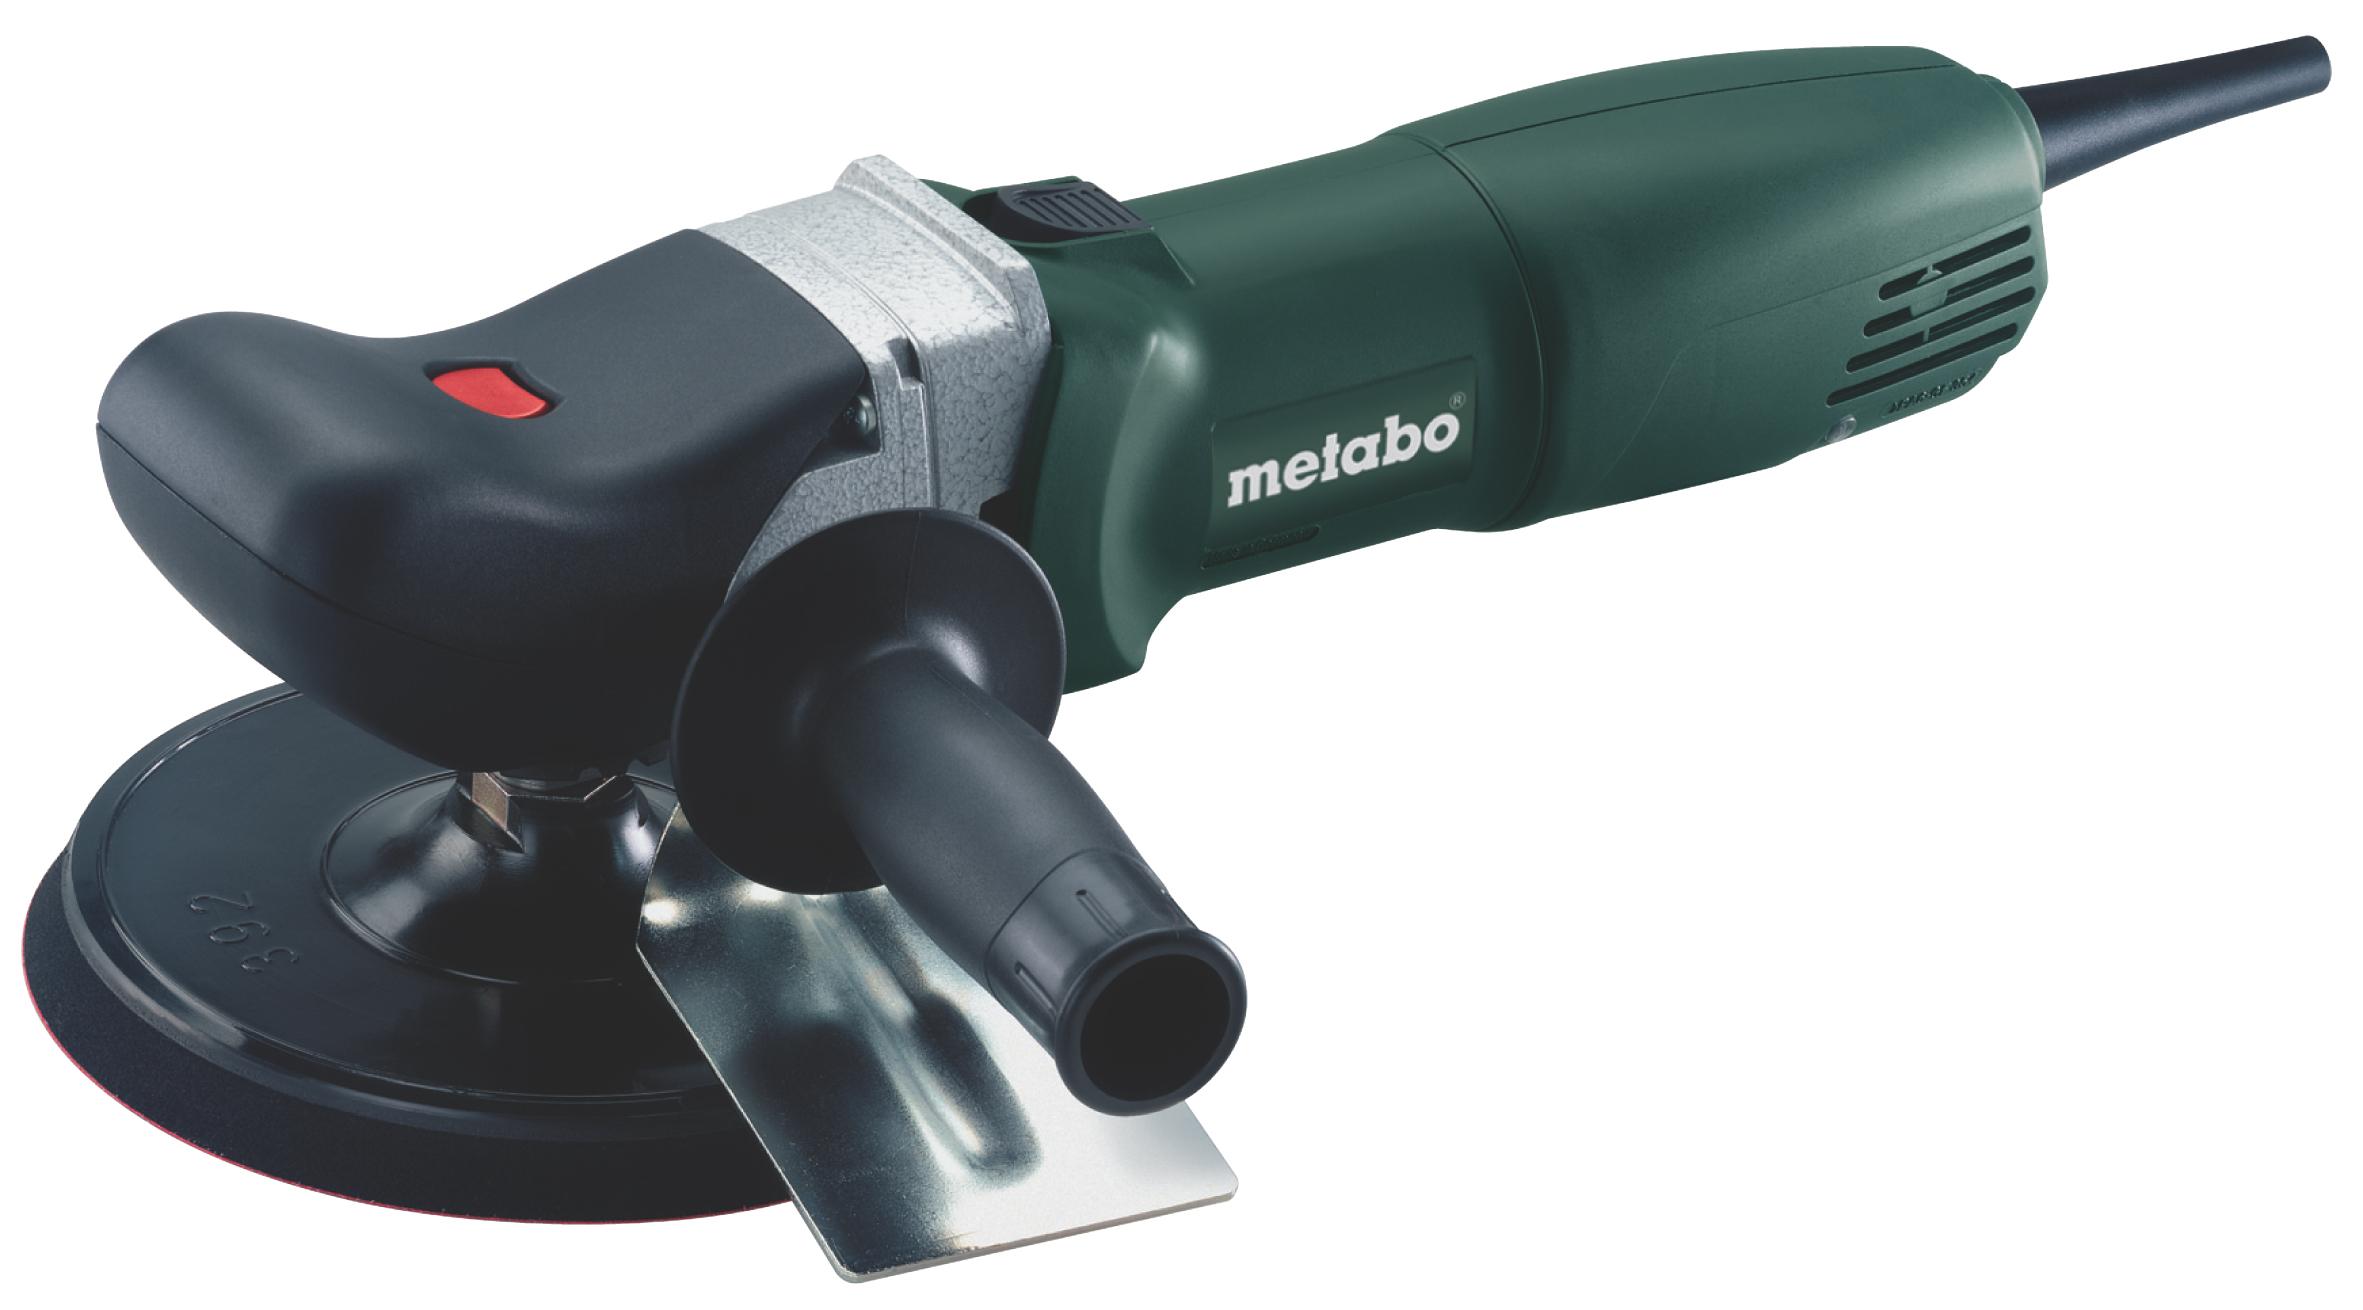 цена на Машина полировальная Metabo Pe 12-175 (602175000)